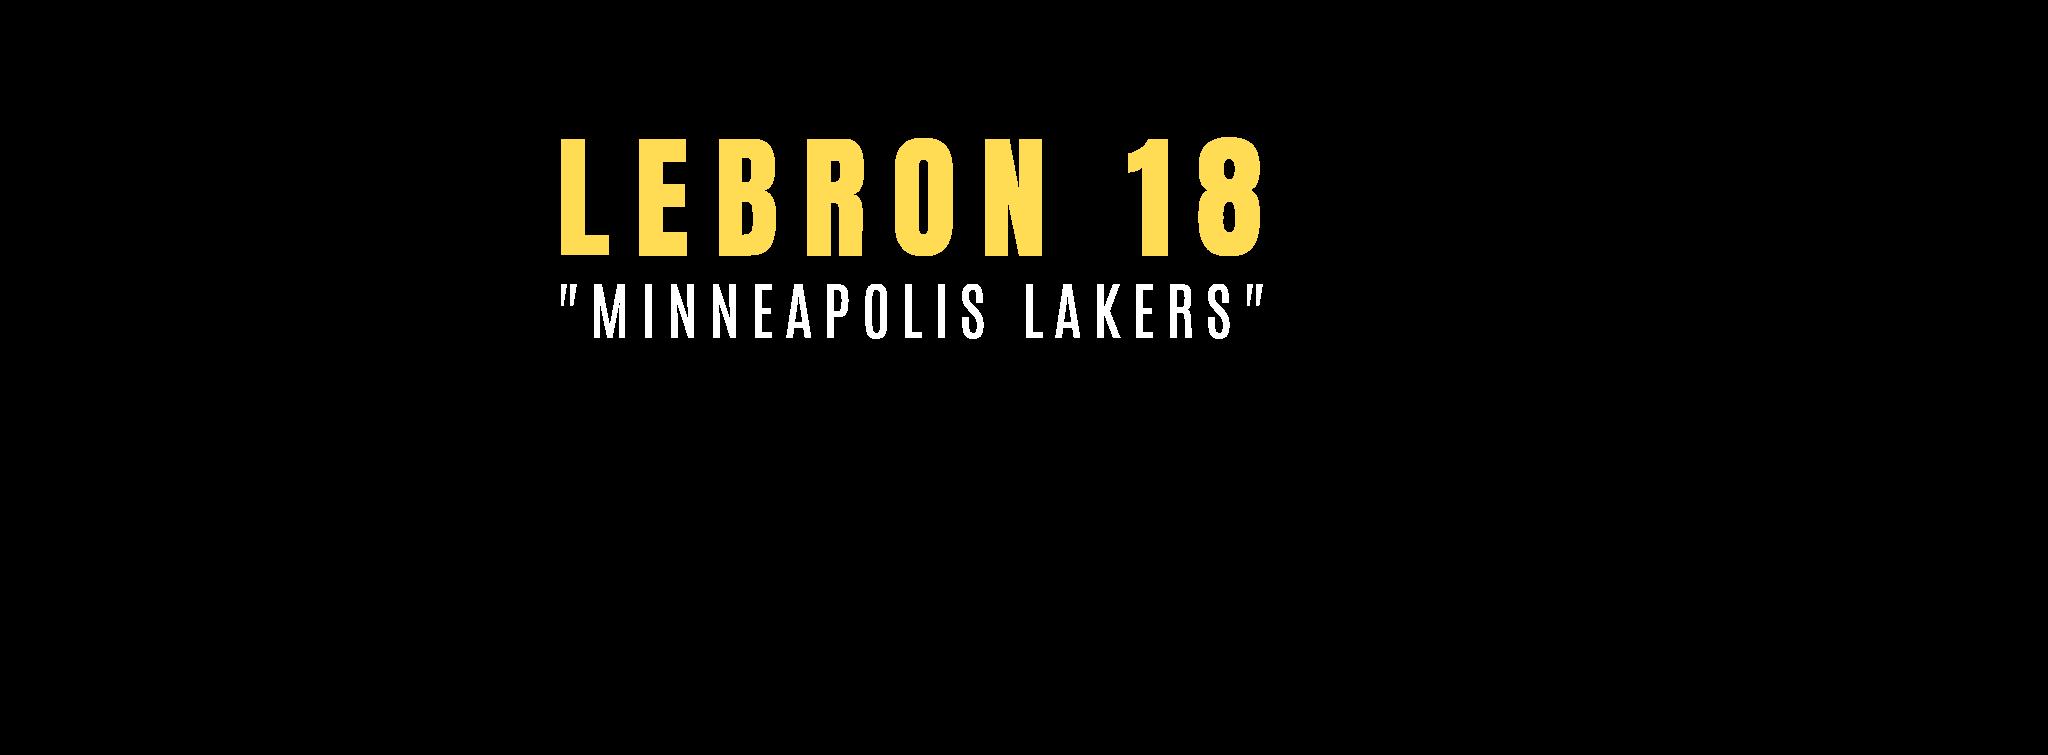 2-289